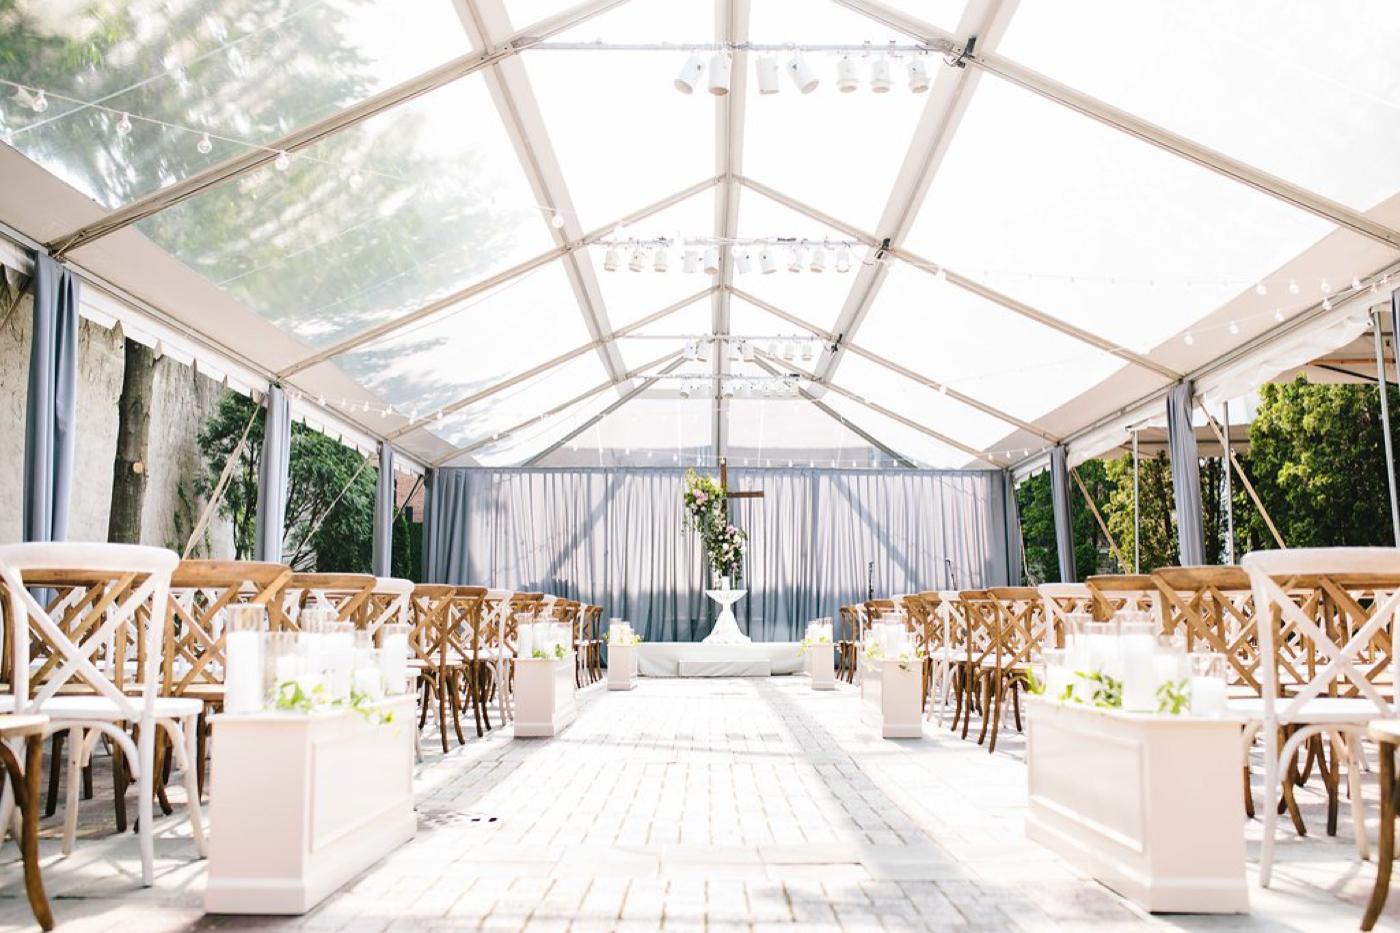 chicago-fine-art-wedding-photography-sakamuri47